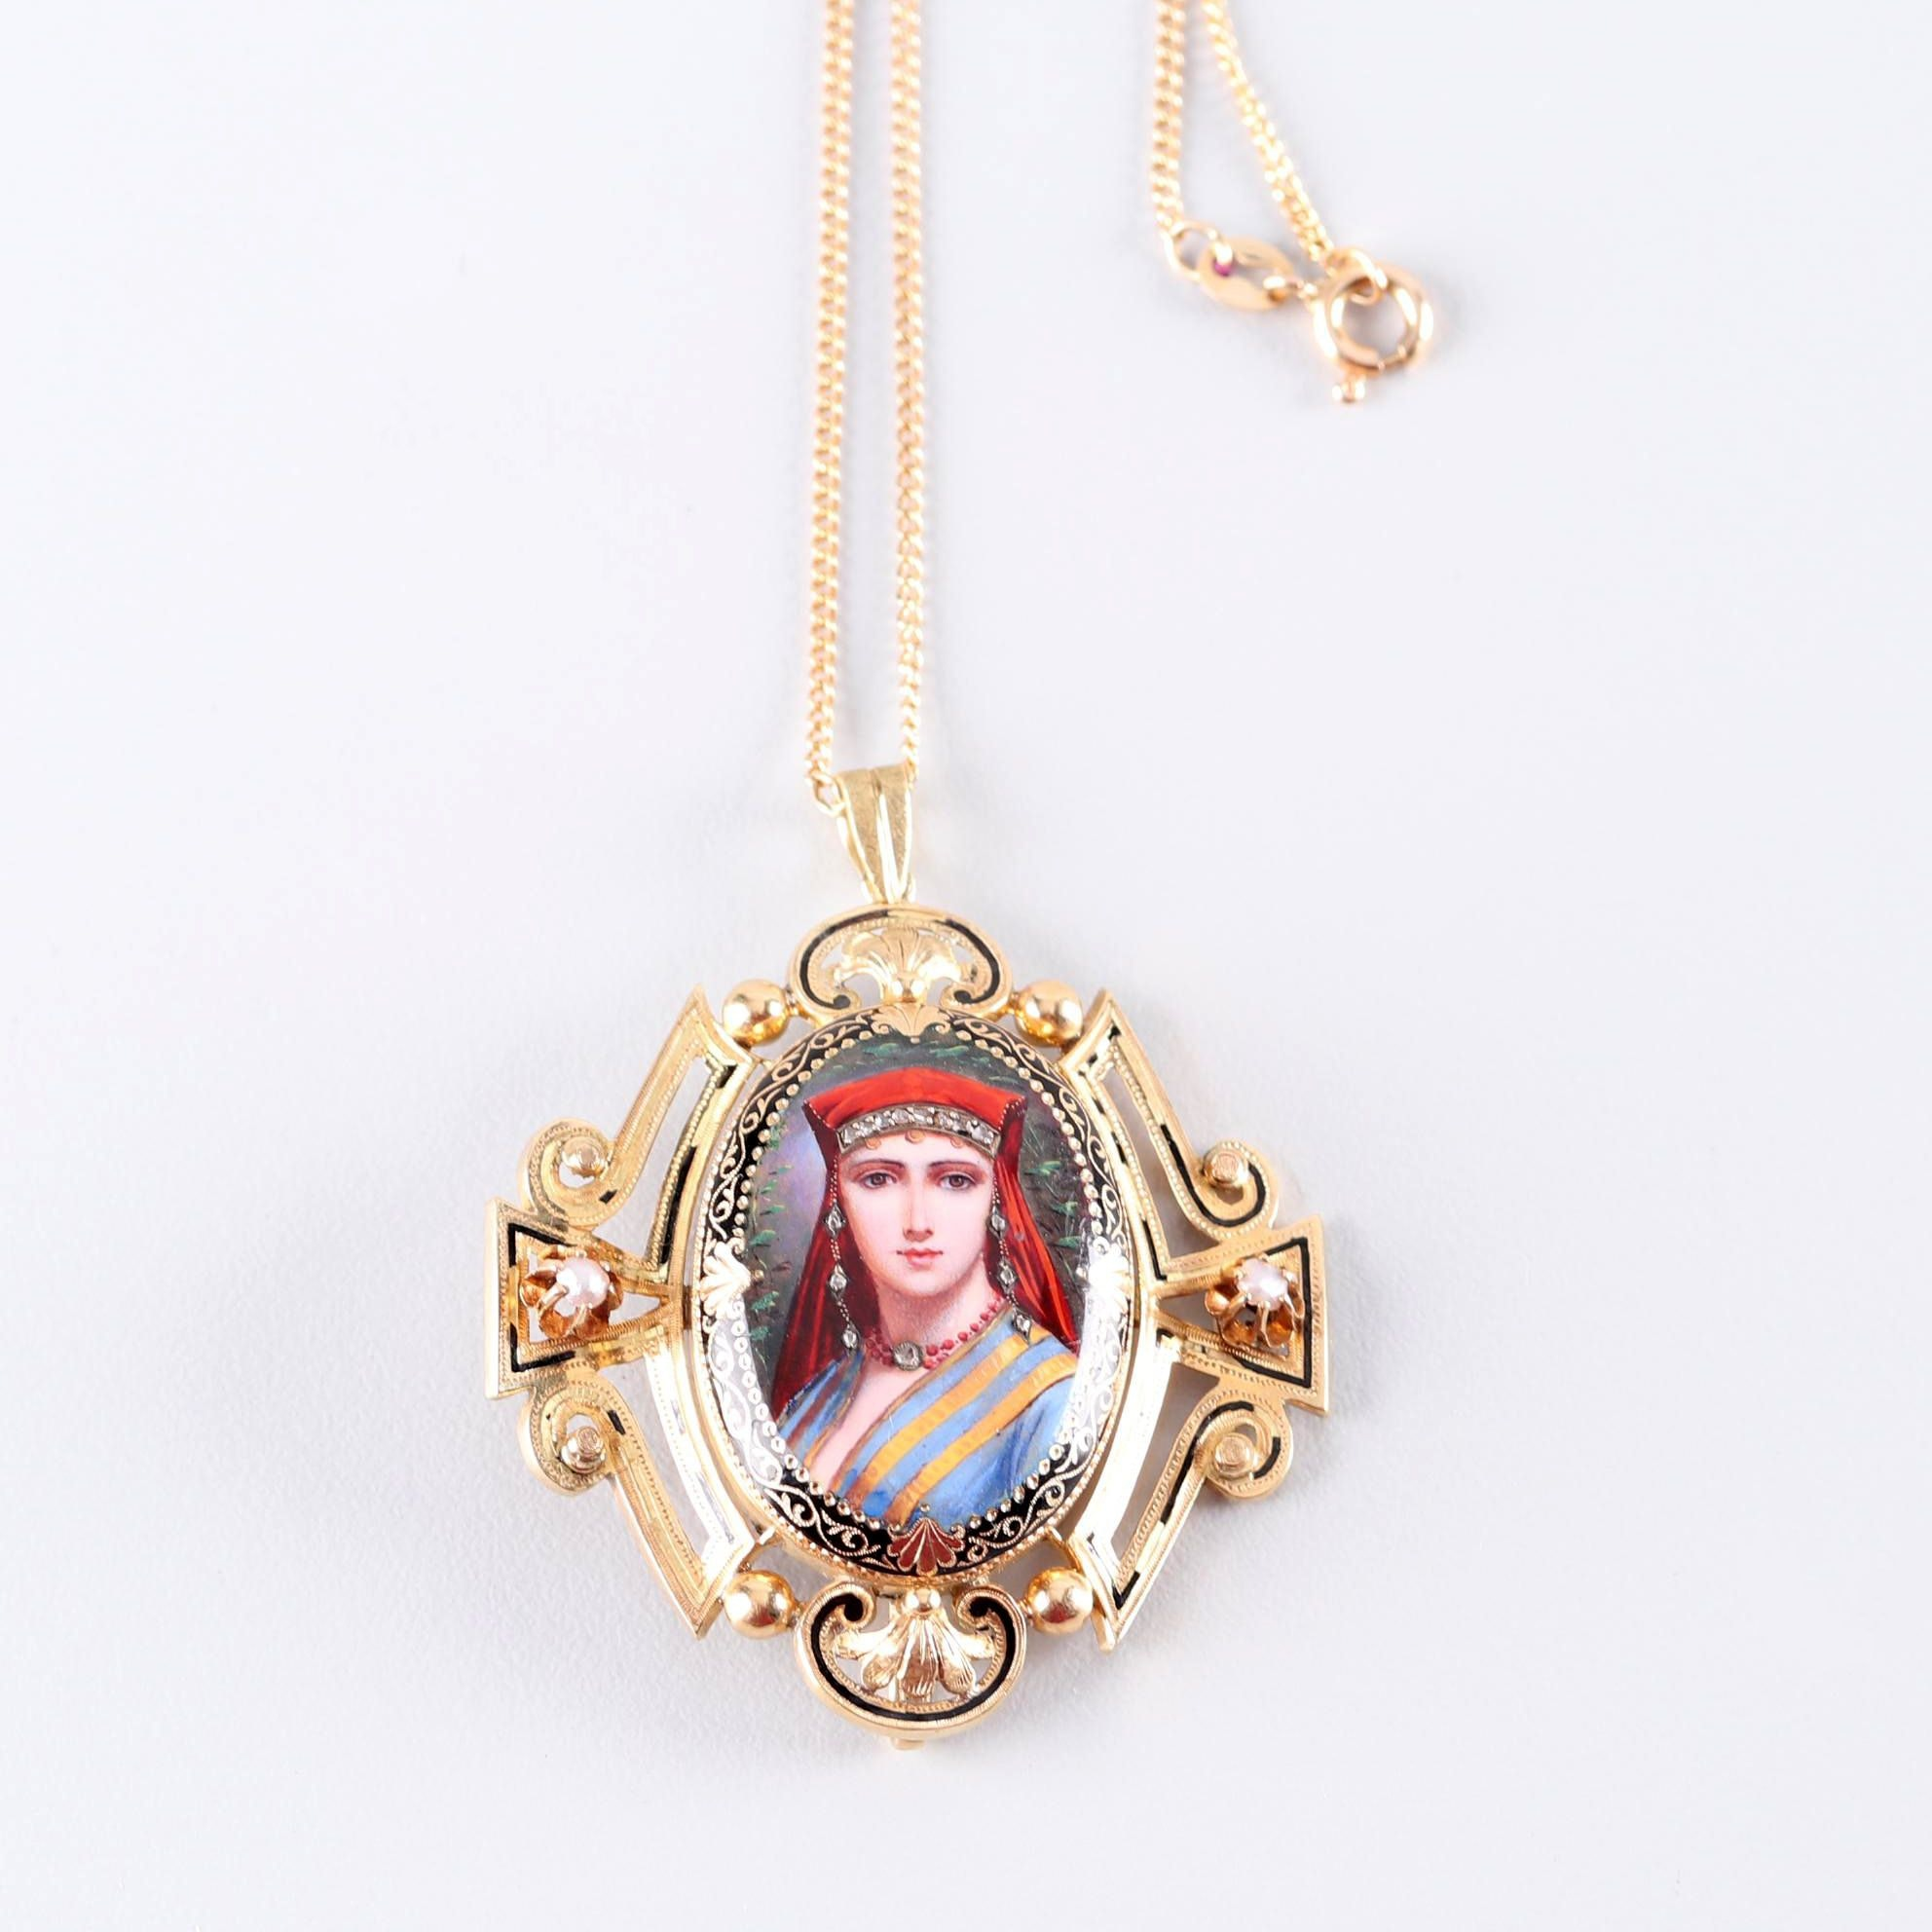 Egyptian Revival Portrait Pendant With Rose Cut Diamonds, 14K Yellow Gold Chain